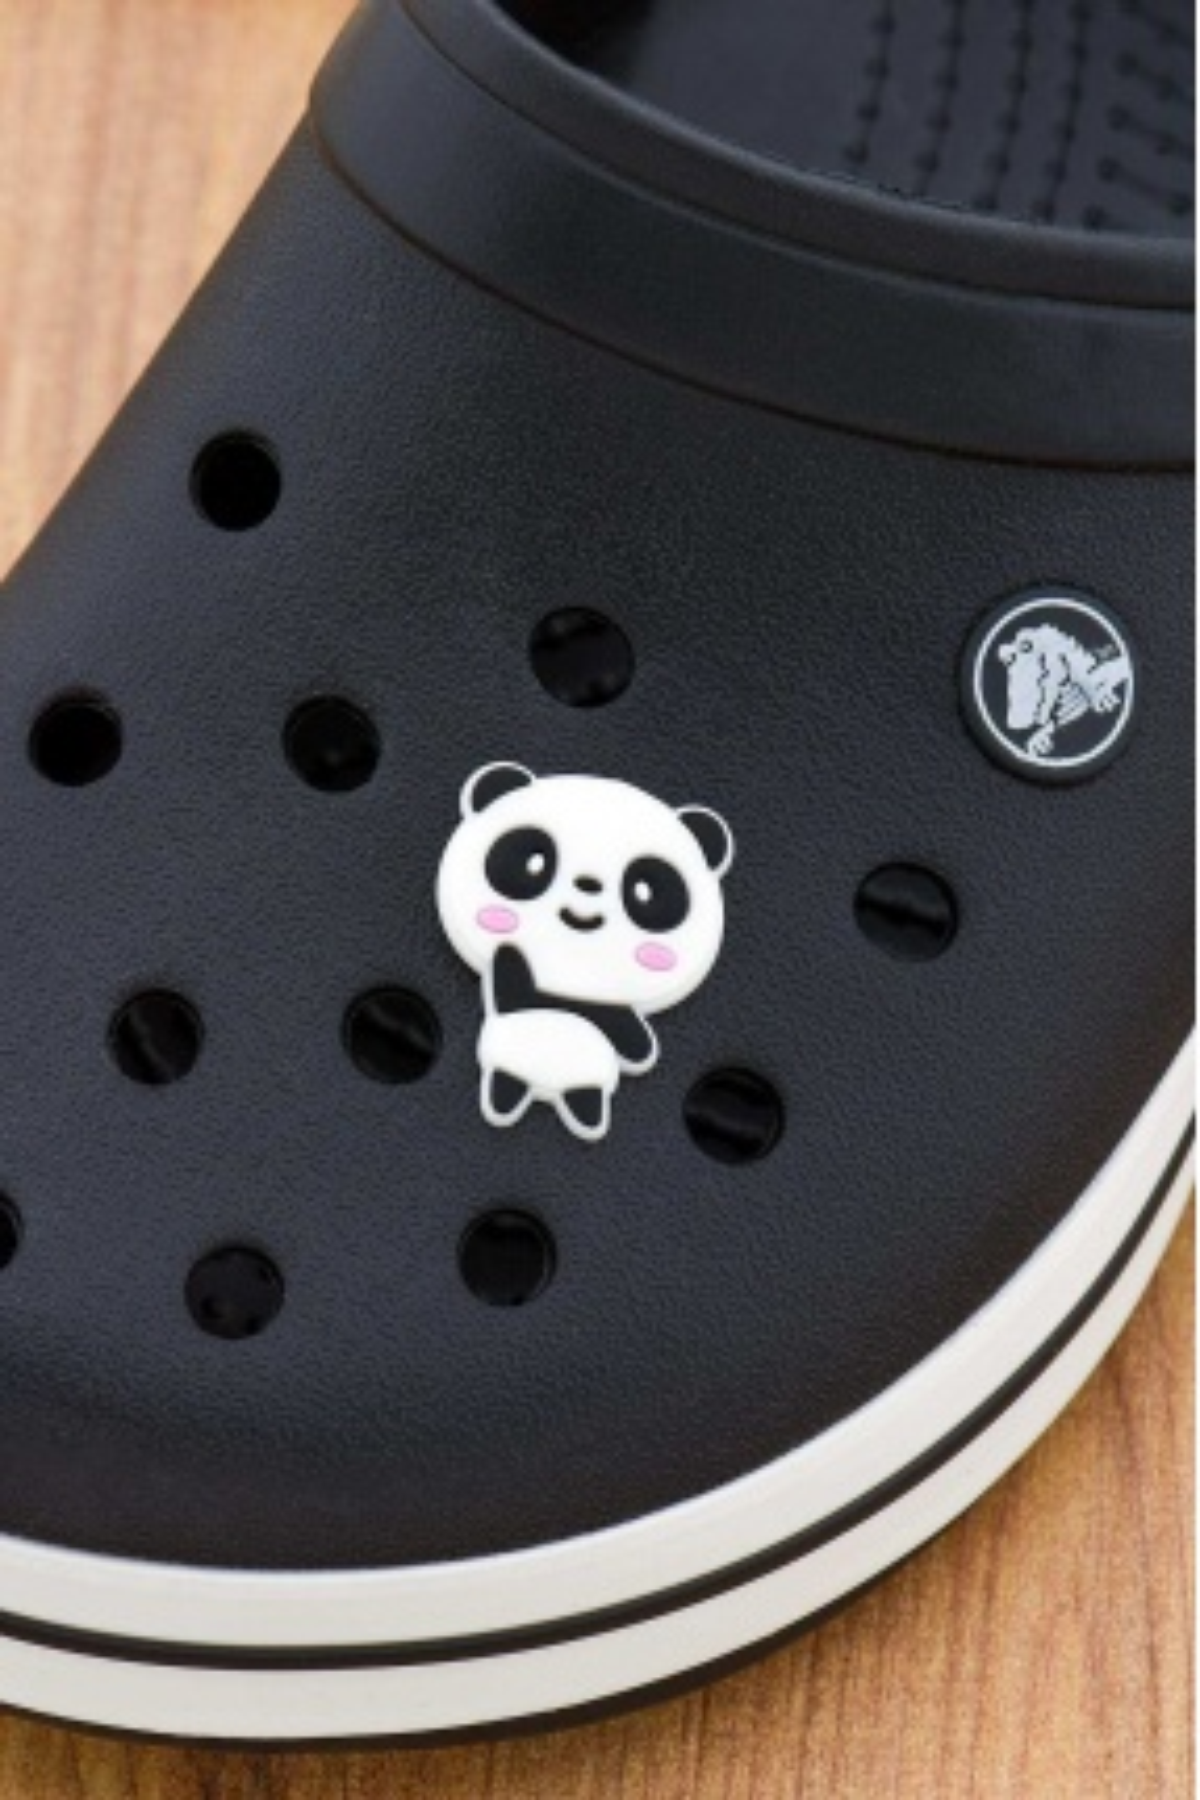 Sevimli Panda Jibbitz Crocs Terlik Süsü Charm Terlik Aksesuarı - CRS0024